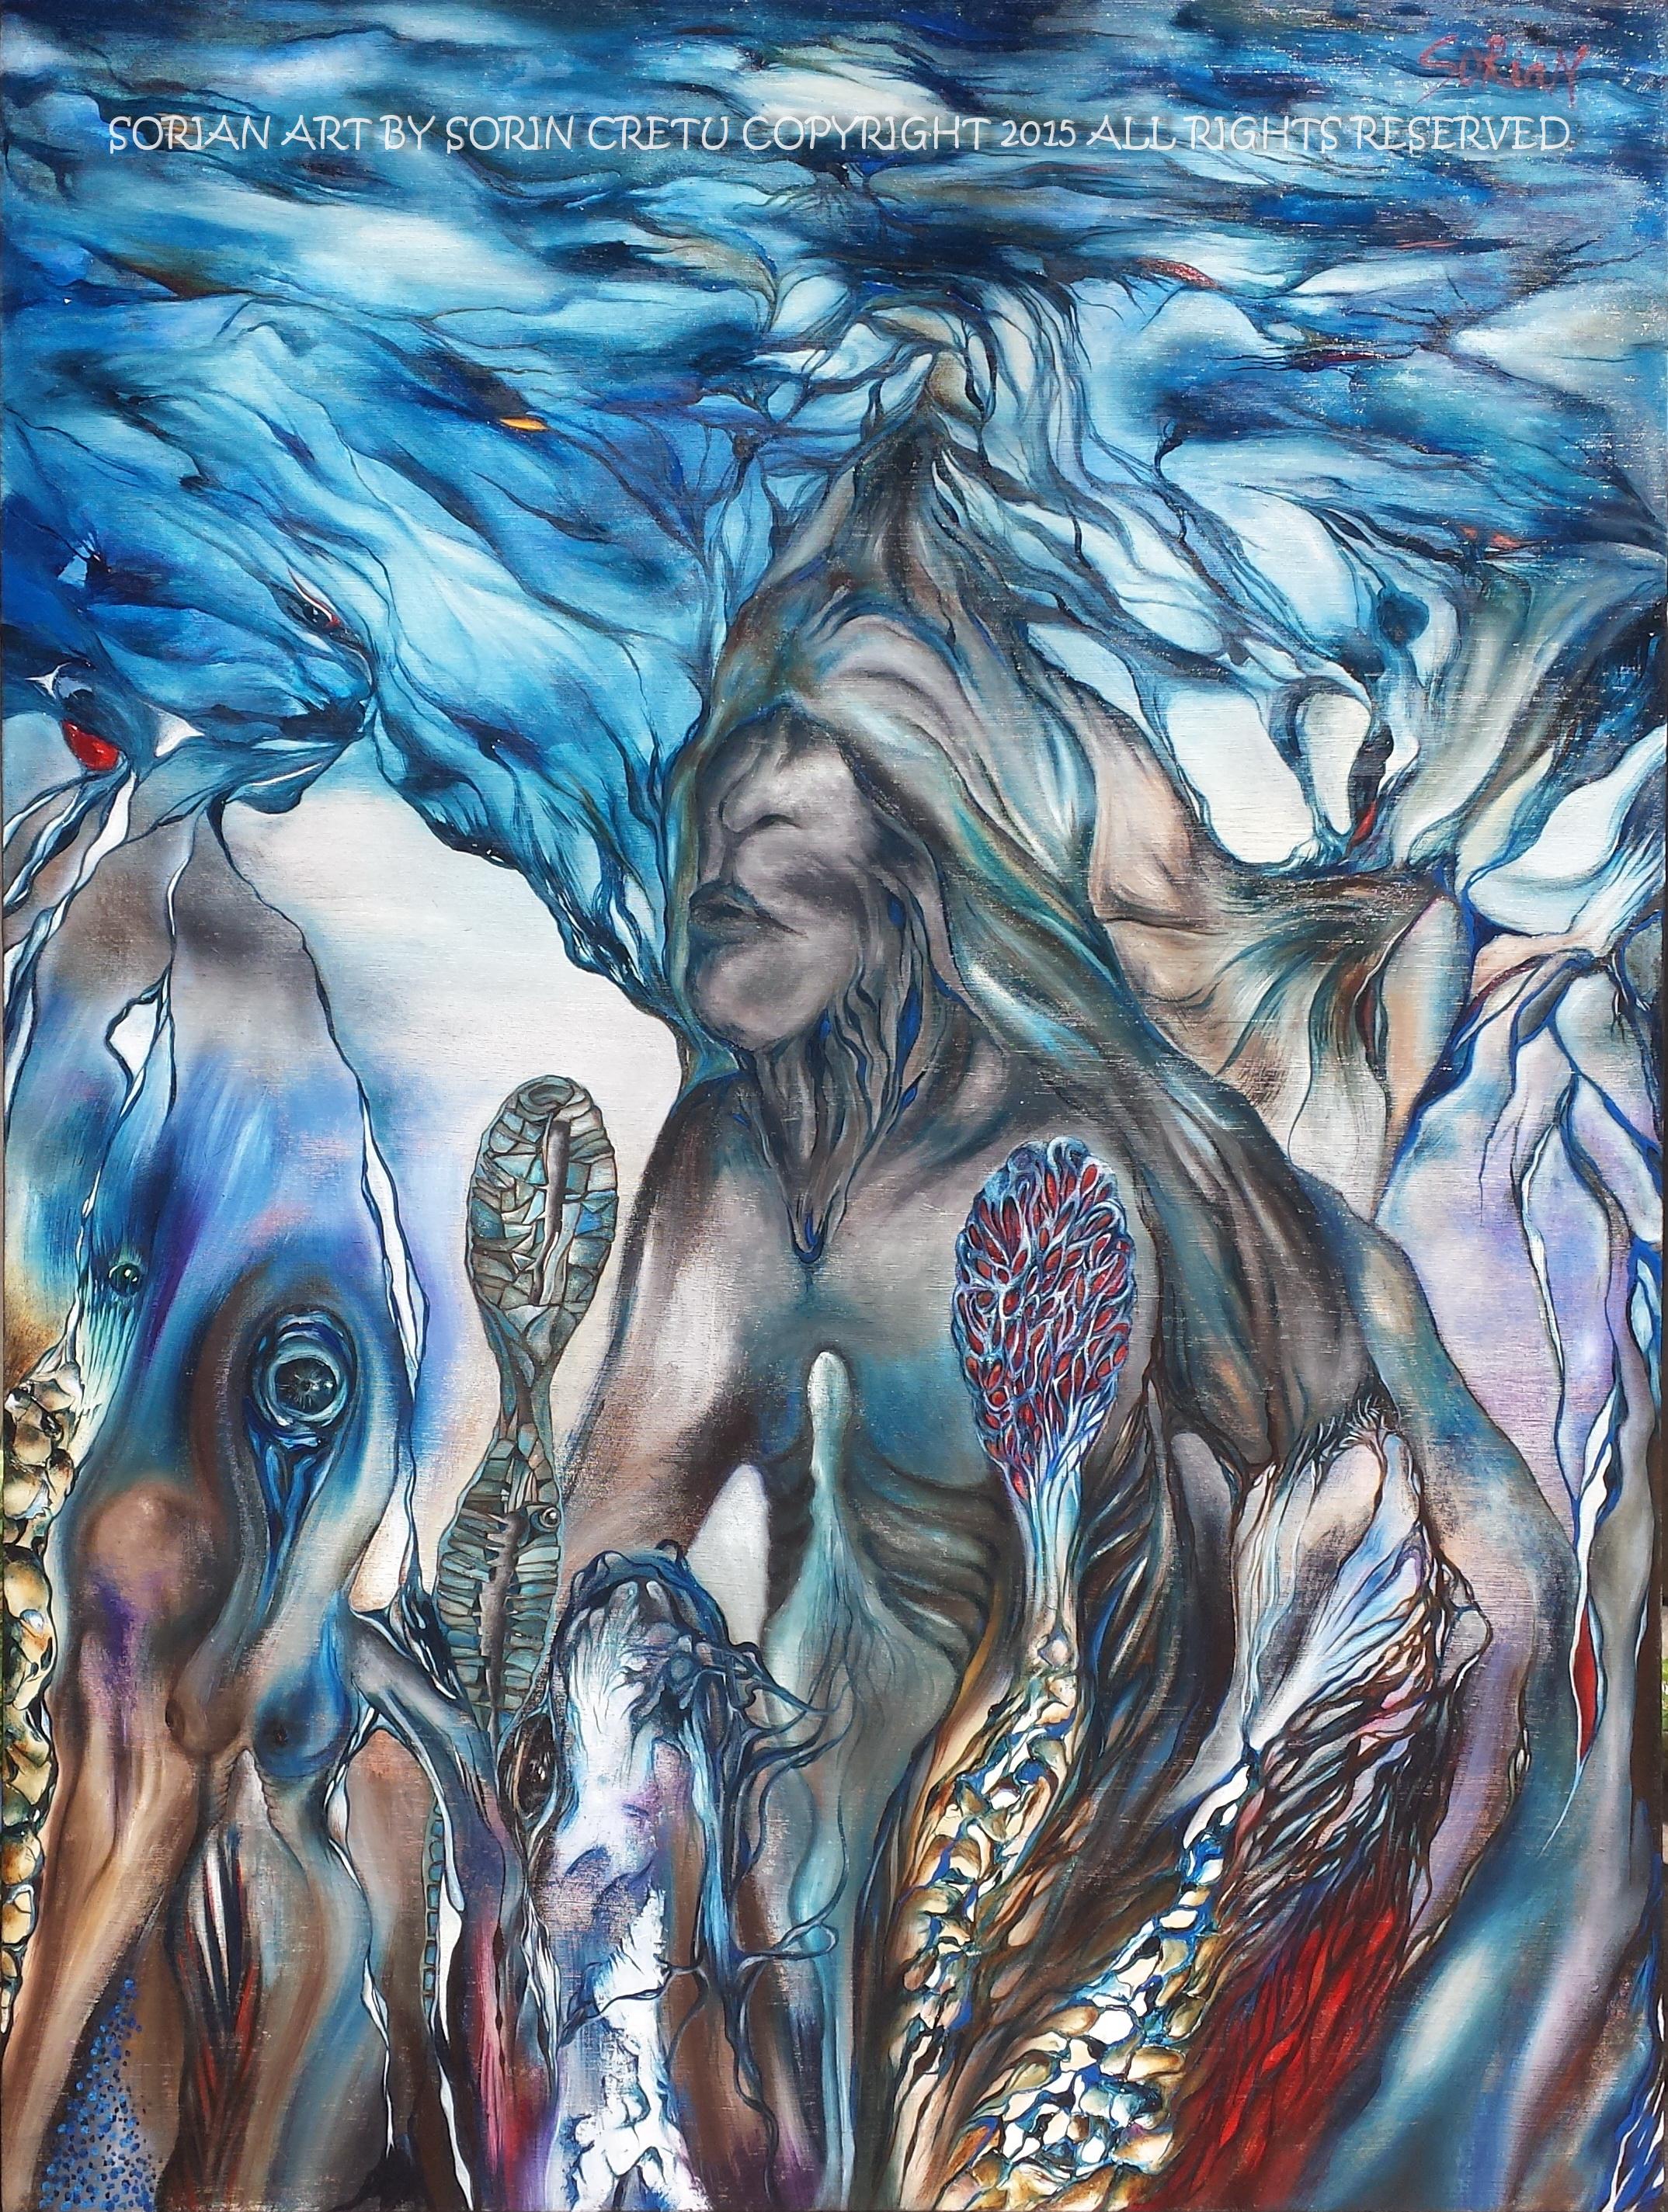 Visions of a Shaman 1 by SORiaN (Sorin Cretu) 2015 - Size 40x30.jpg